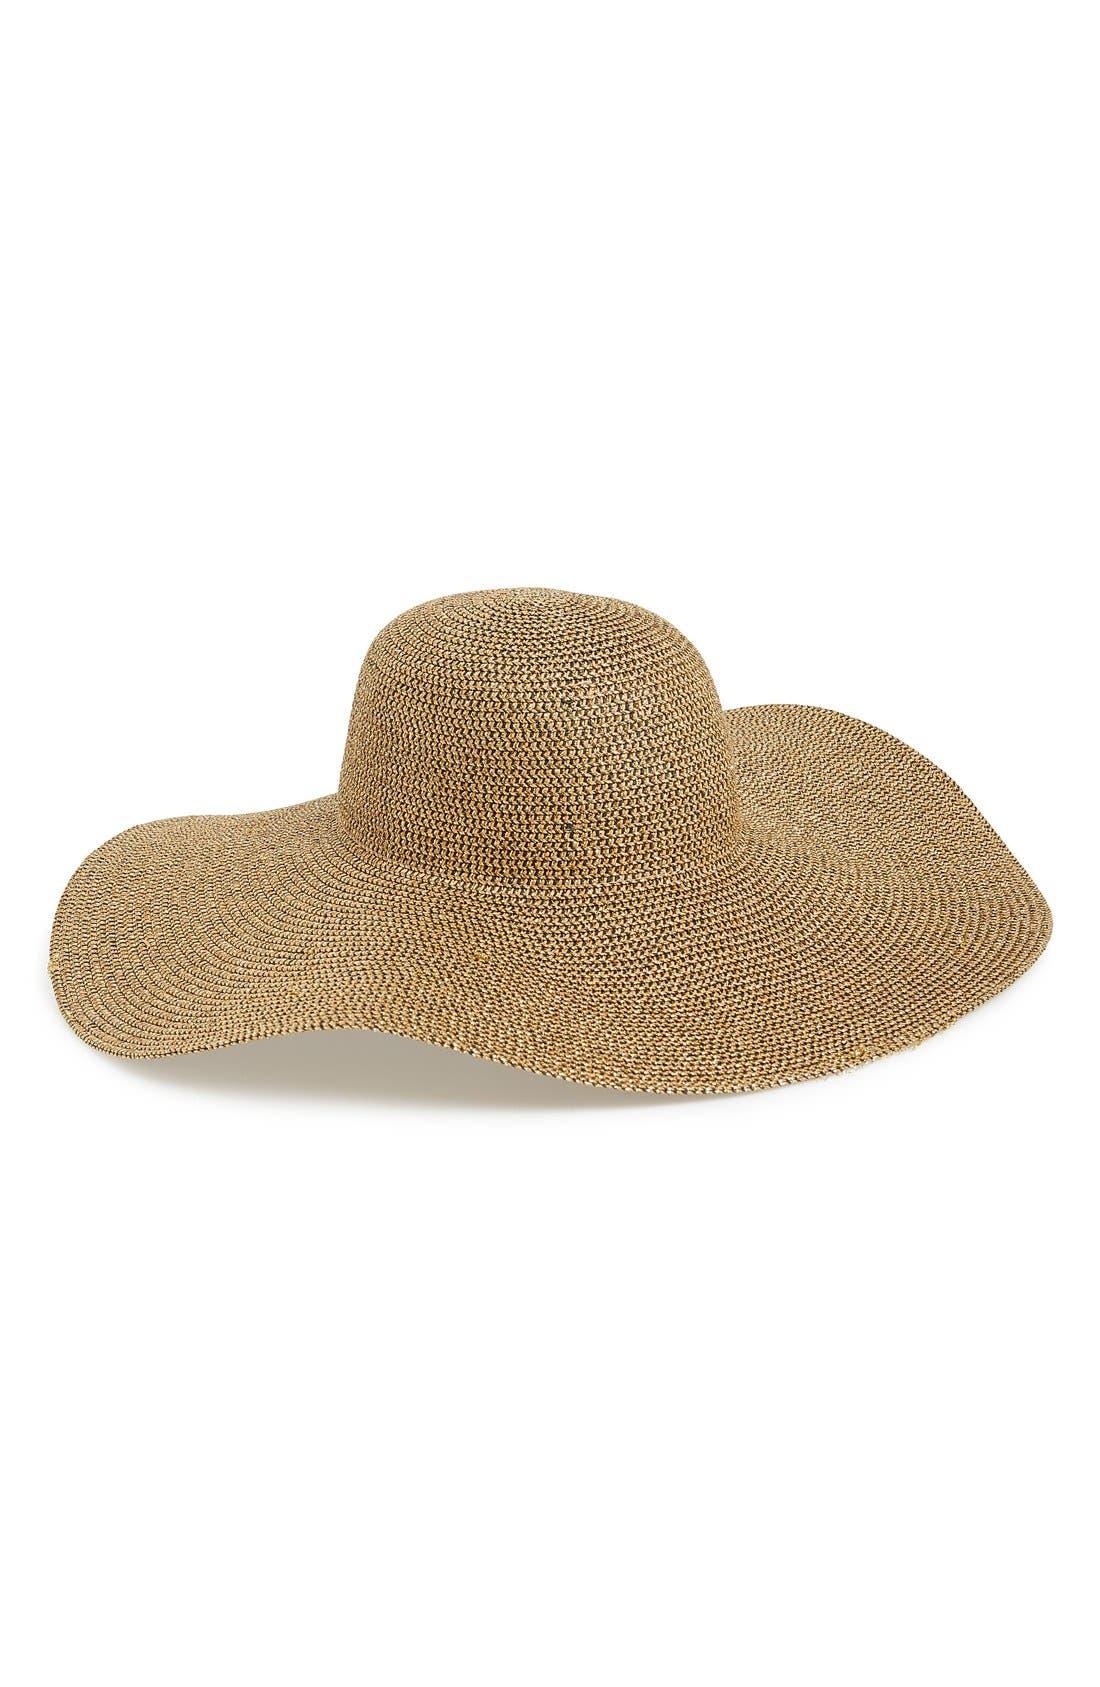 Alternate Image 1 Selected - Phase 3 Metallic Floppy Straw Hat